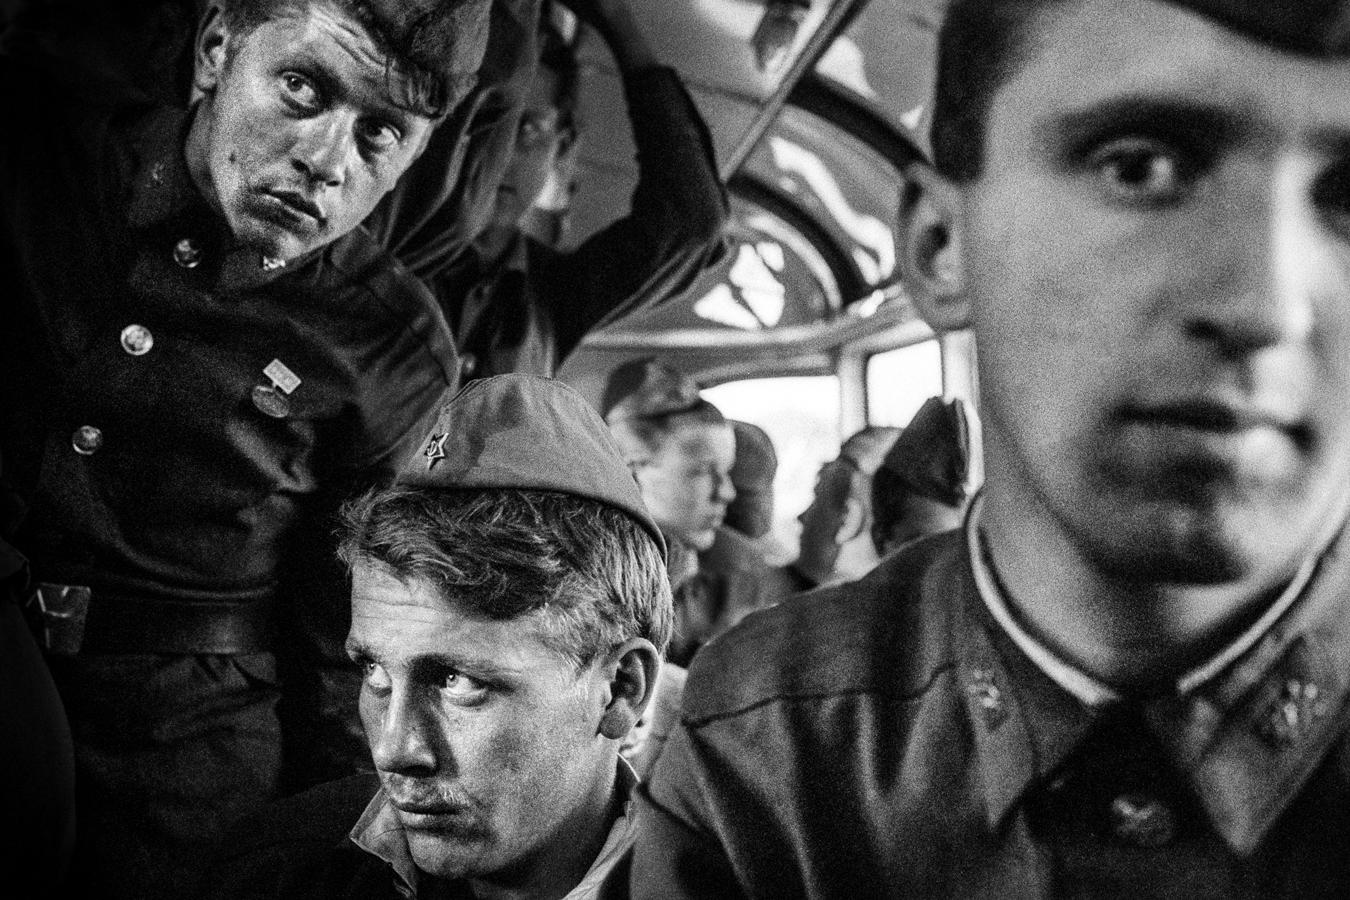 odchod sovetskych vojsk 1991 cudlin